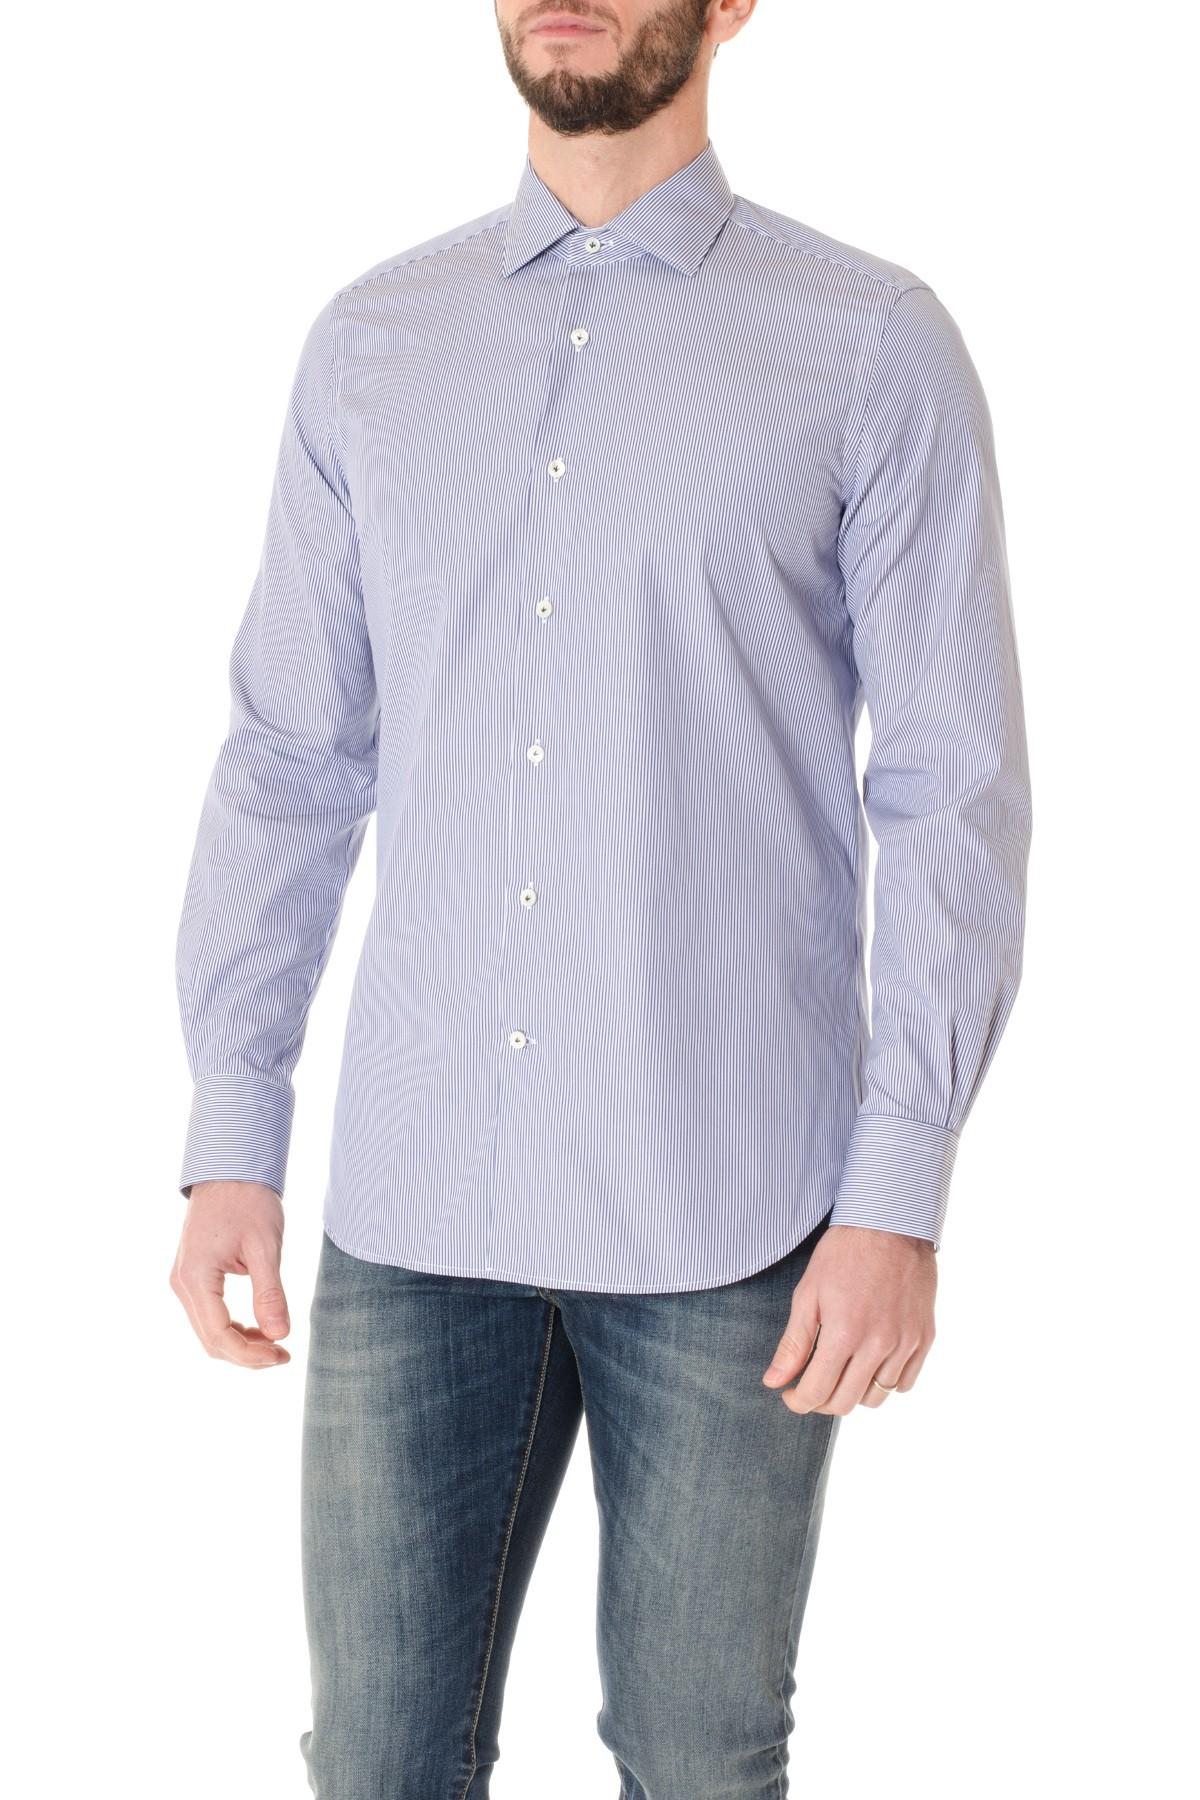 su Fontana sfondo bianco AI a BORSA righe Camicia blu Rione gqtZSwg